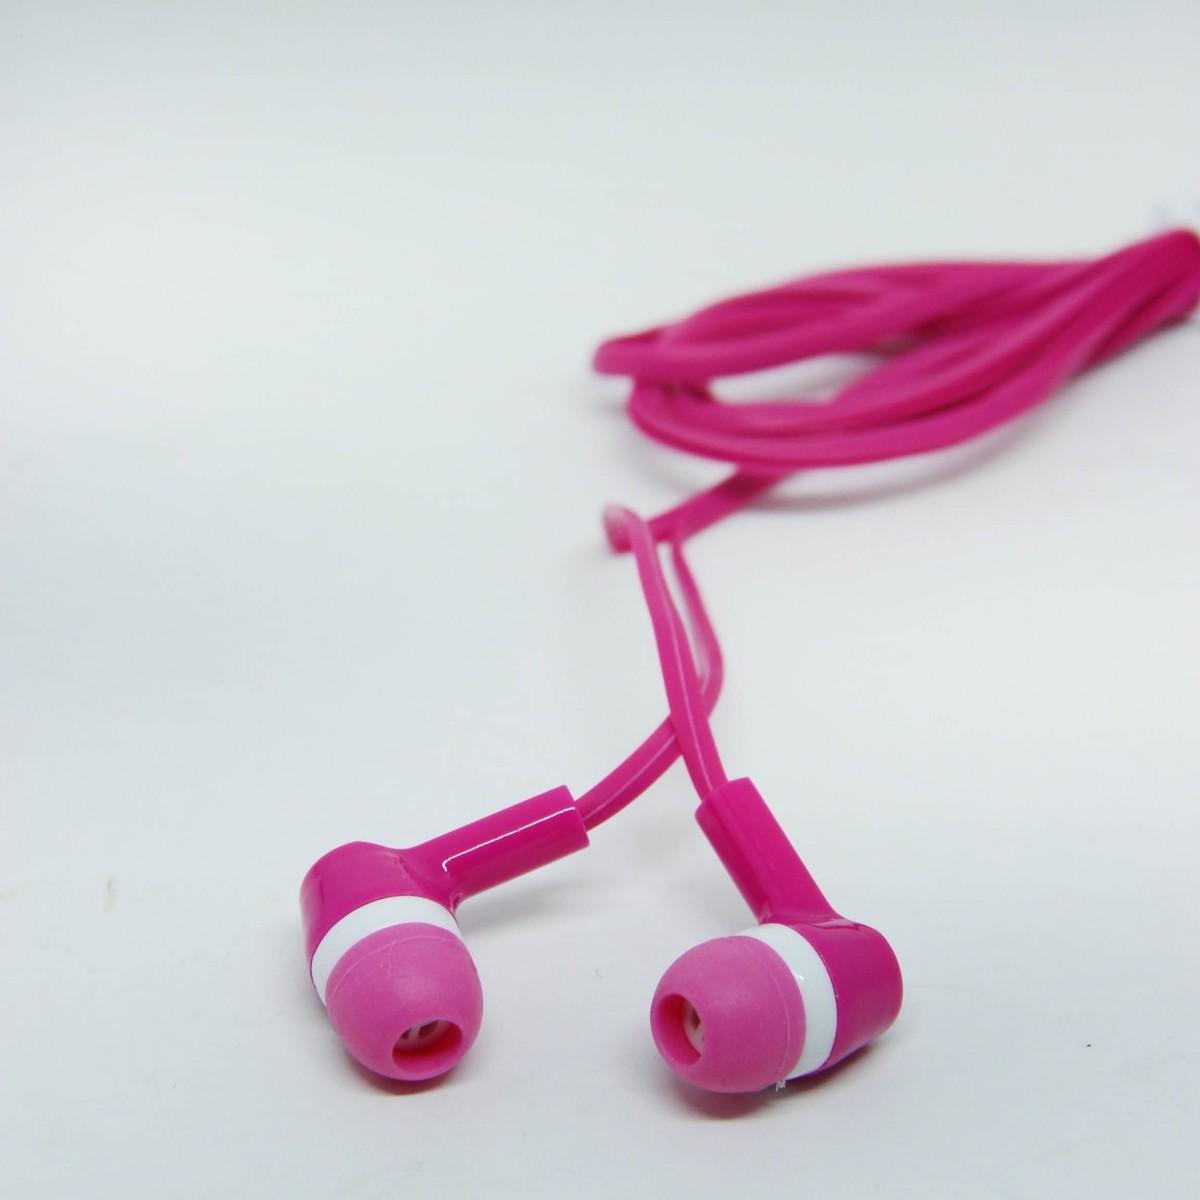 Fone de Ouvido P2 Stereo - Pink